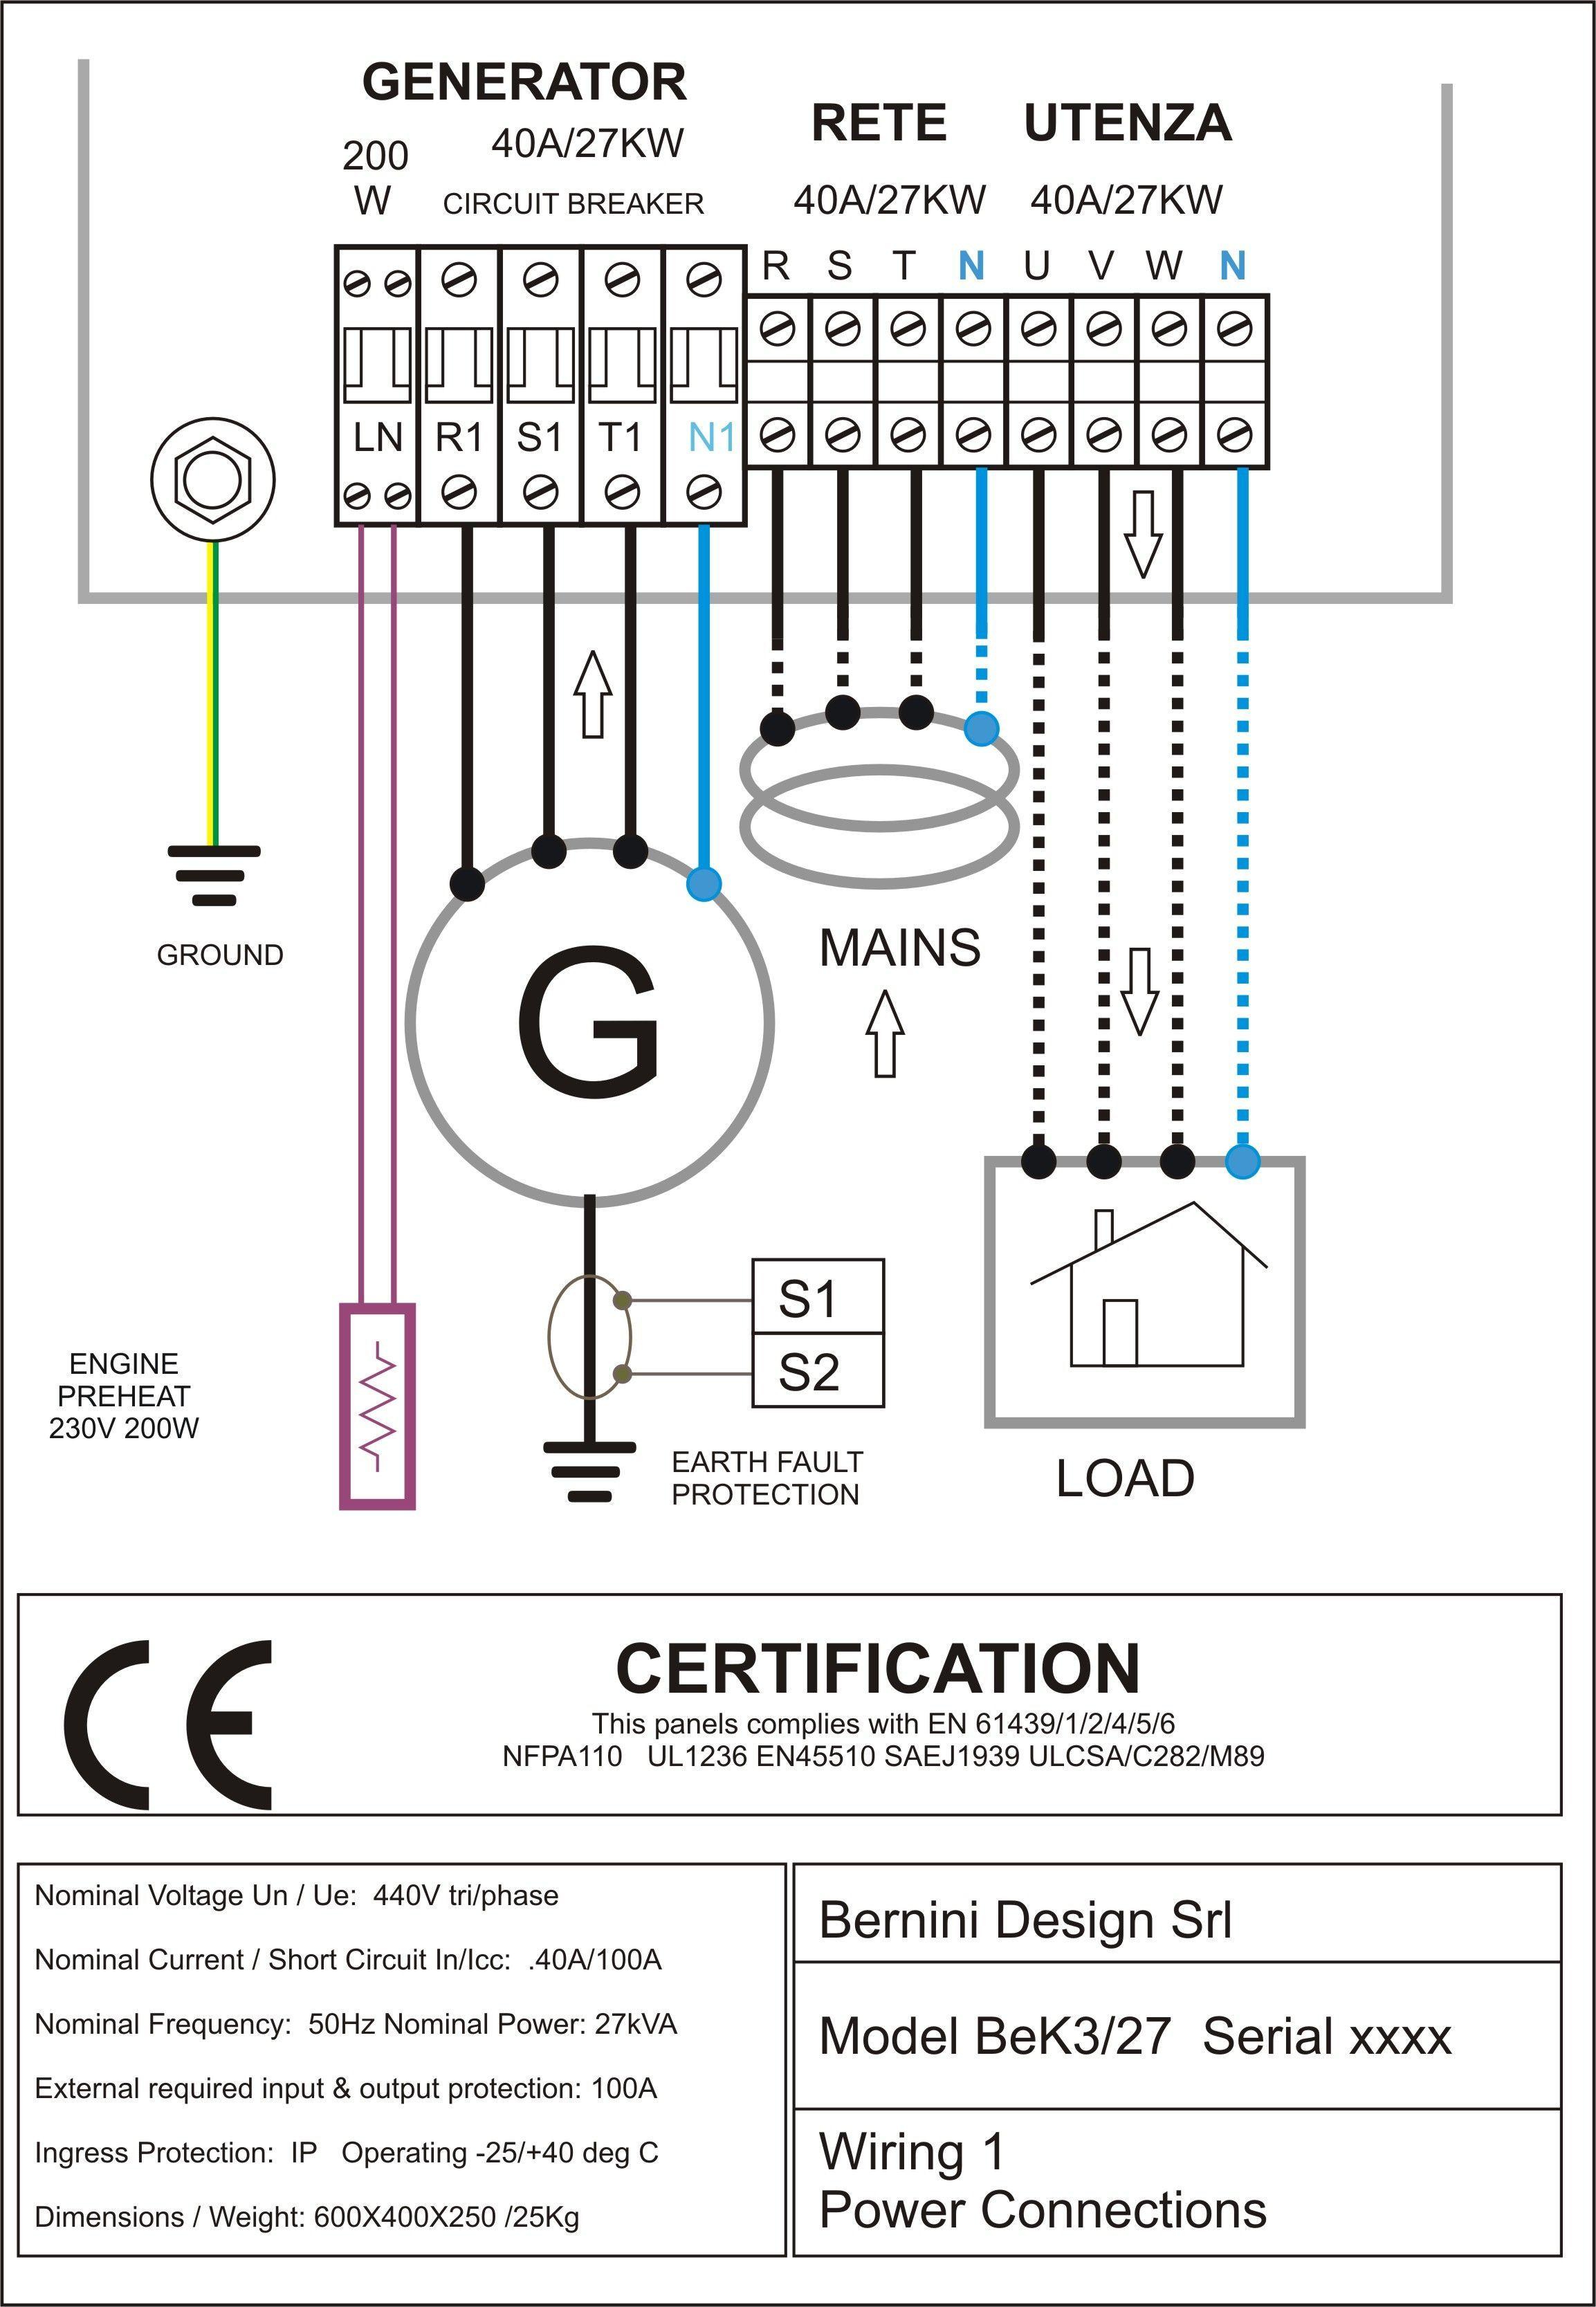 acura el wiring diagram plc panel wiring diagram electrical circuit diagram  diagram  plc panel wiring diagram electrical